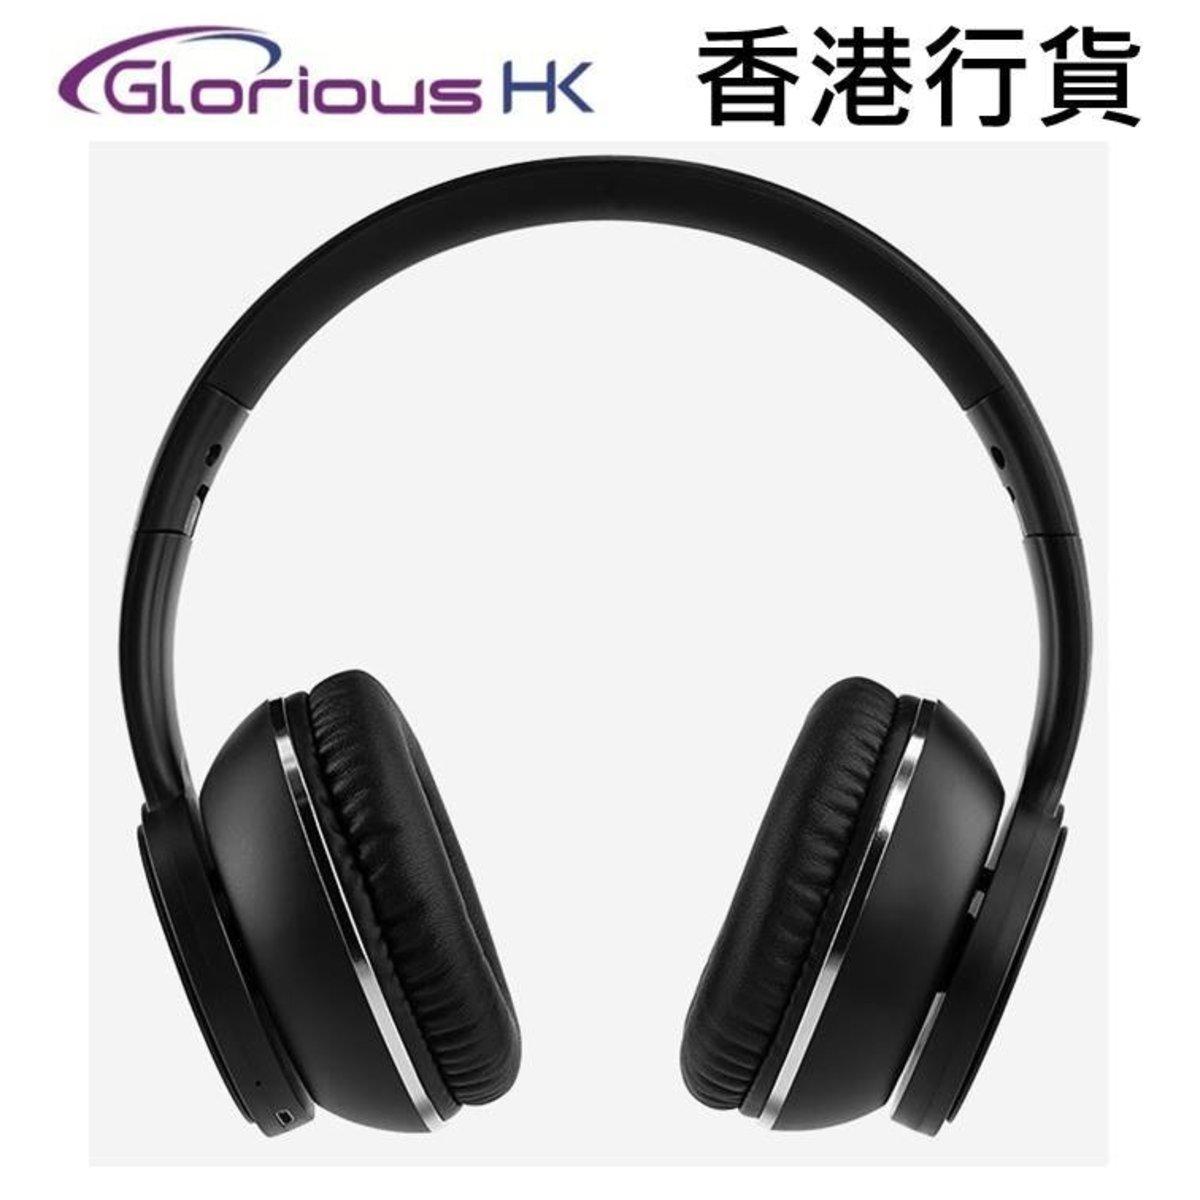 Wireless Foldable Headphone IX600 Black